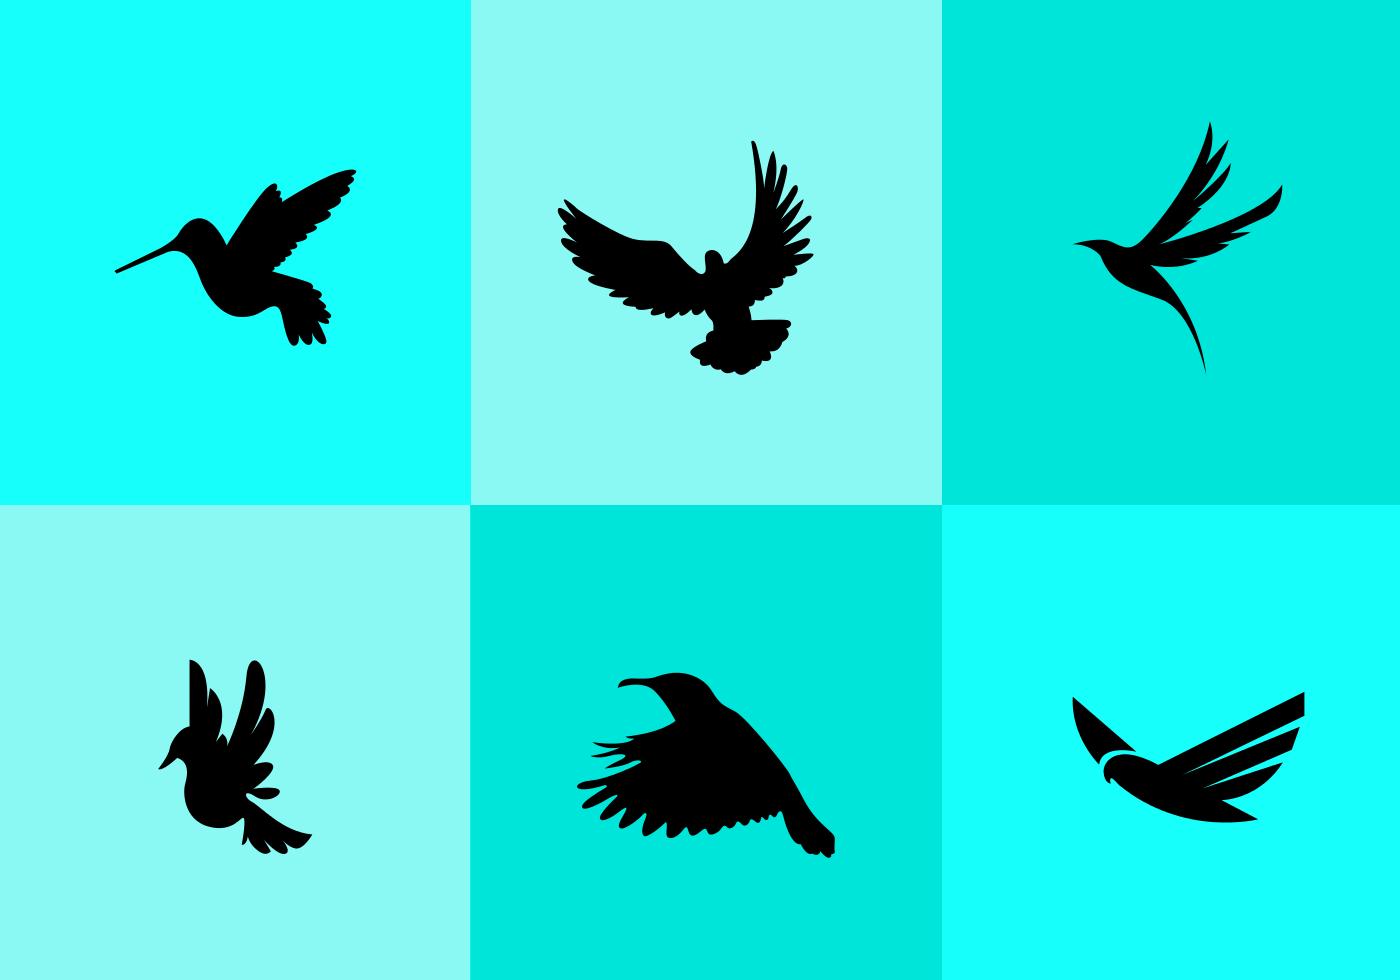 Bird Free Vector Art - (18598 Free Downloads)